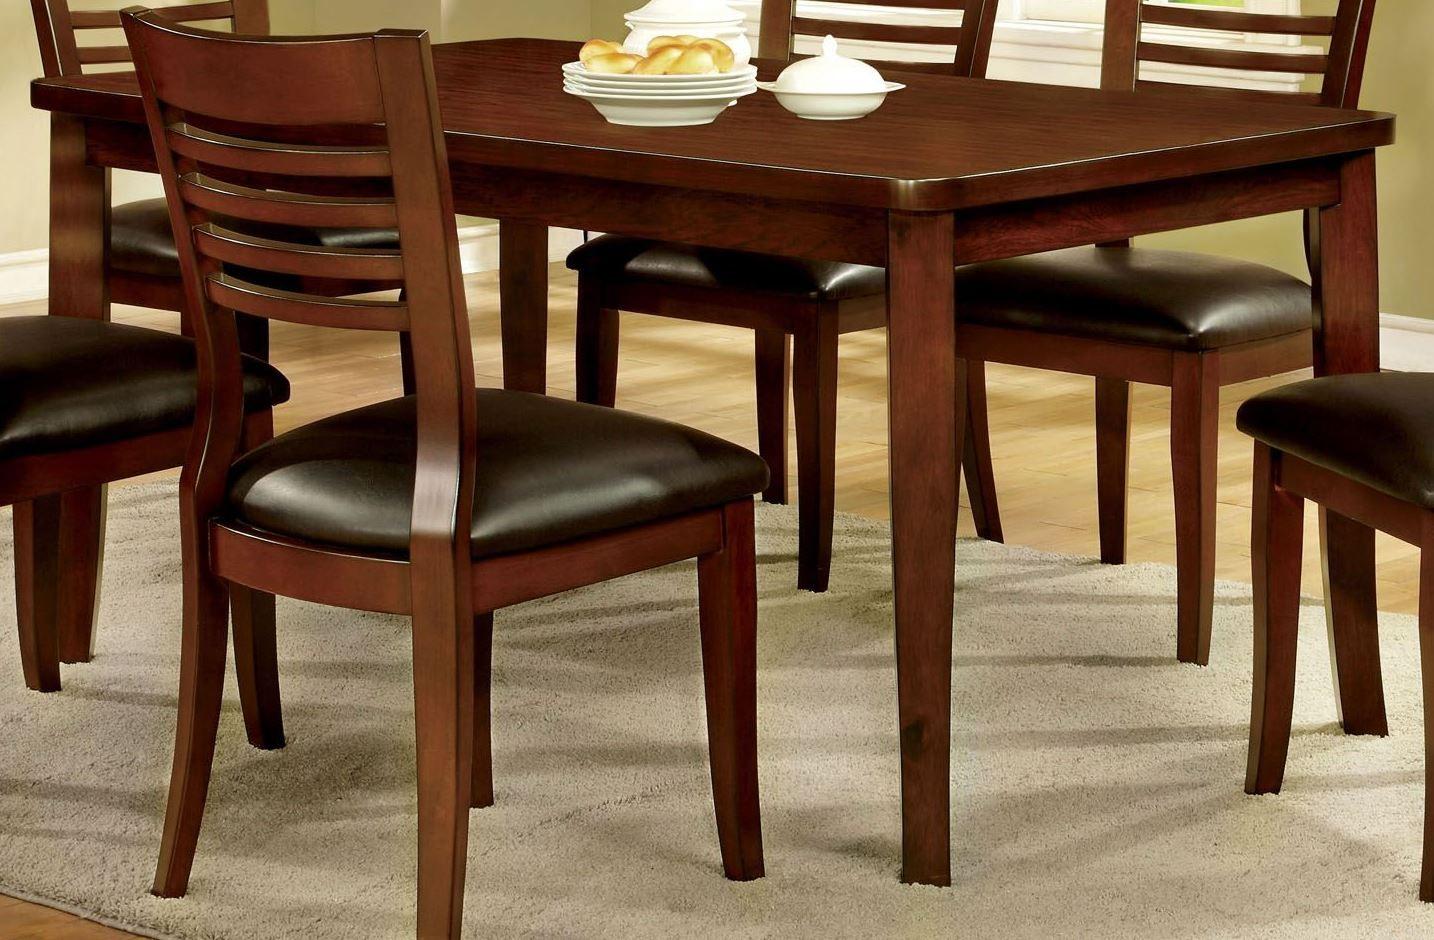 dwight i medium oak dining room set from furniture of america cm3988t coleman furniture. Black Bedroom Furniture Sets. Home Design Ideas